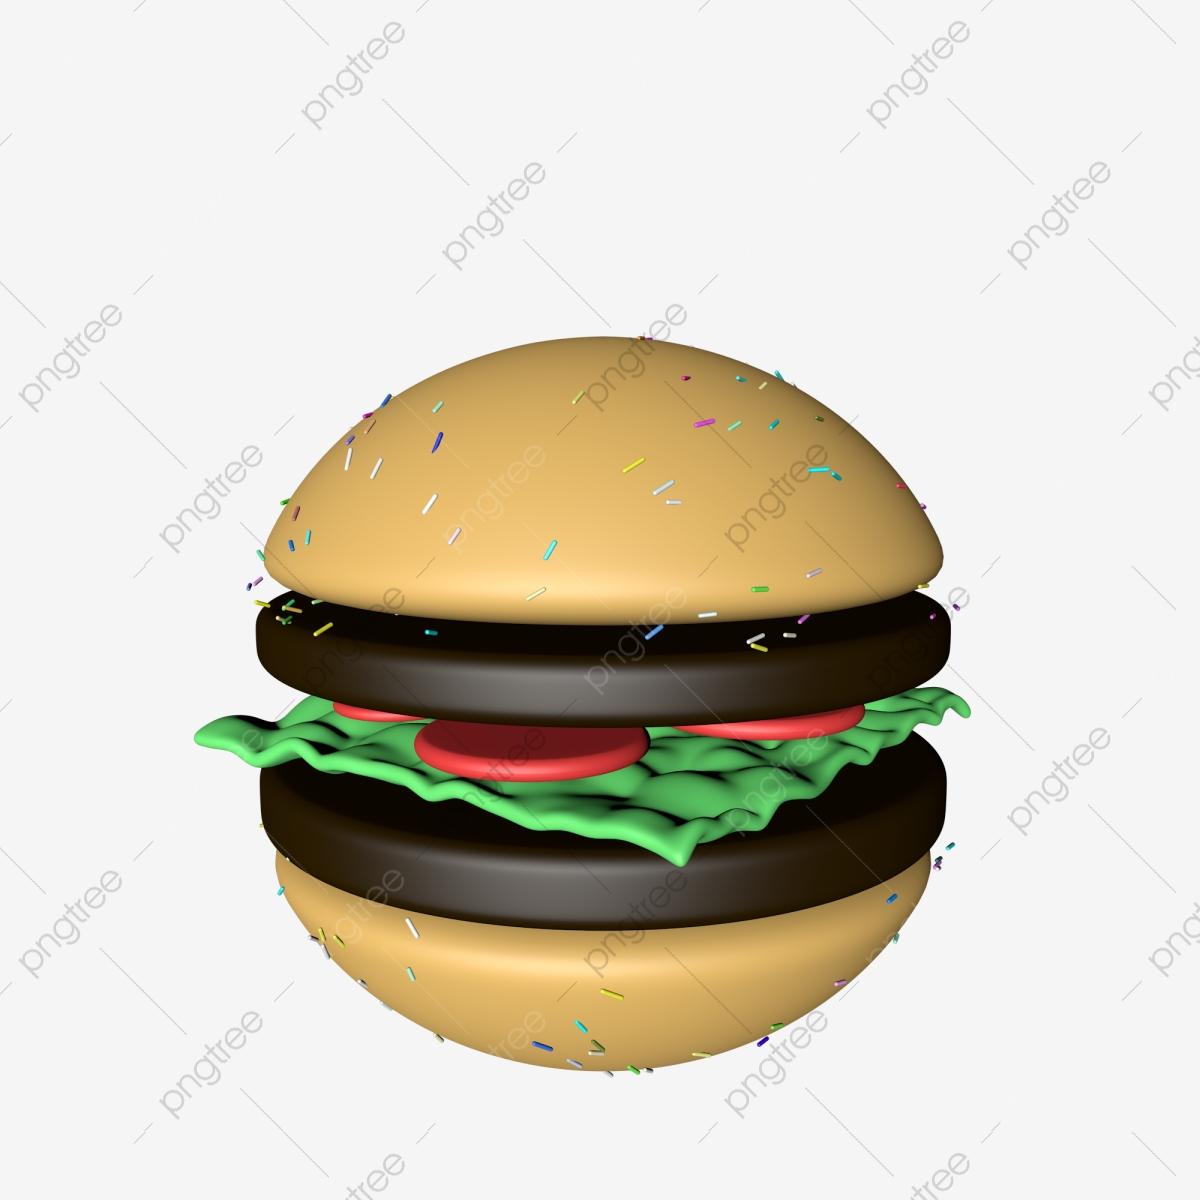 3d Gourmet Burger C4d Modeling Food Material, 3d Burger, Burger ... free library